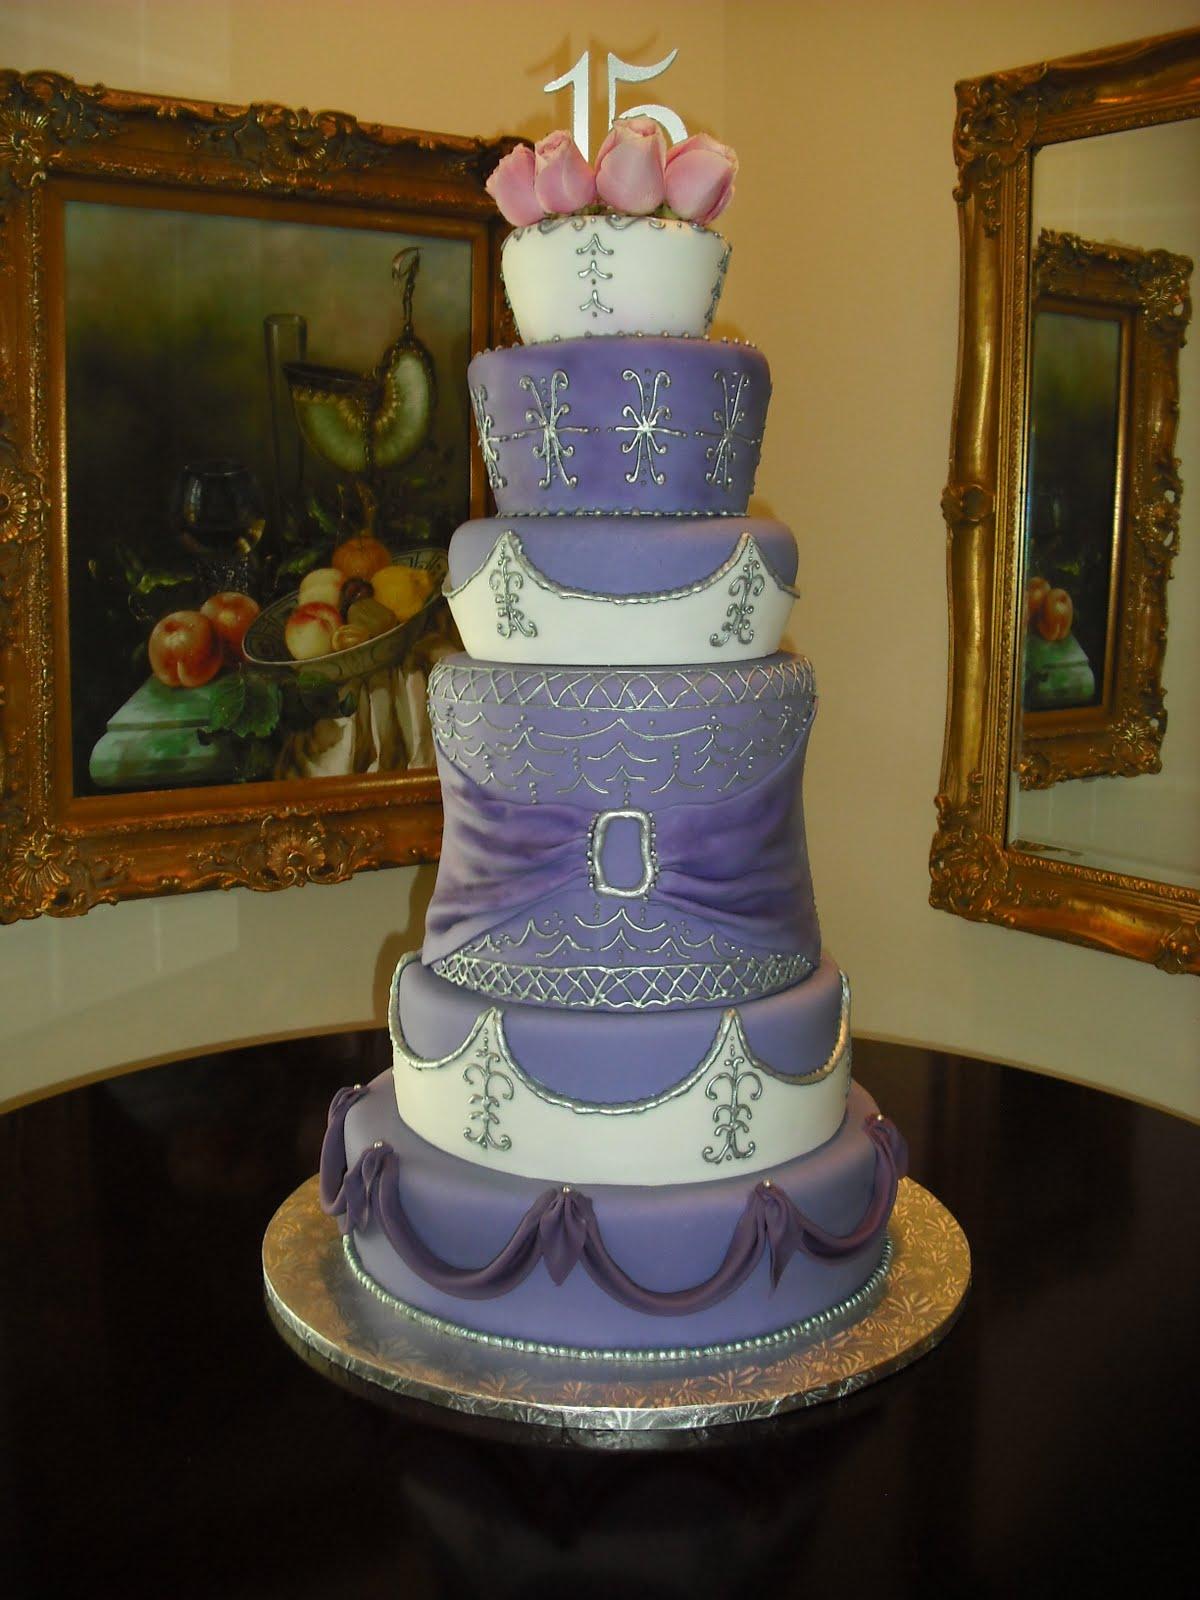 Pin Quinceanera Cakes La 88278jpg Cake On Pinterest